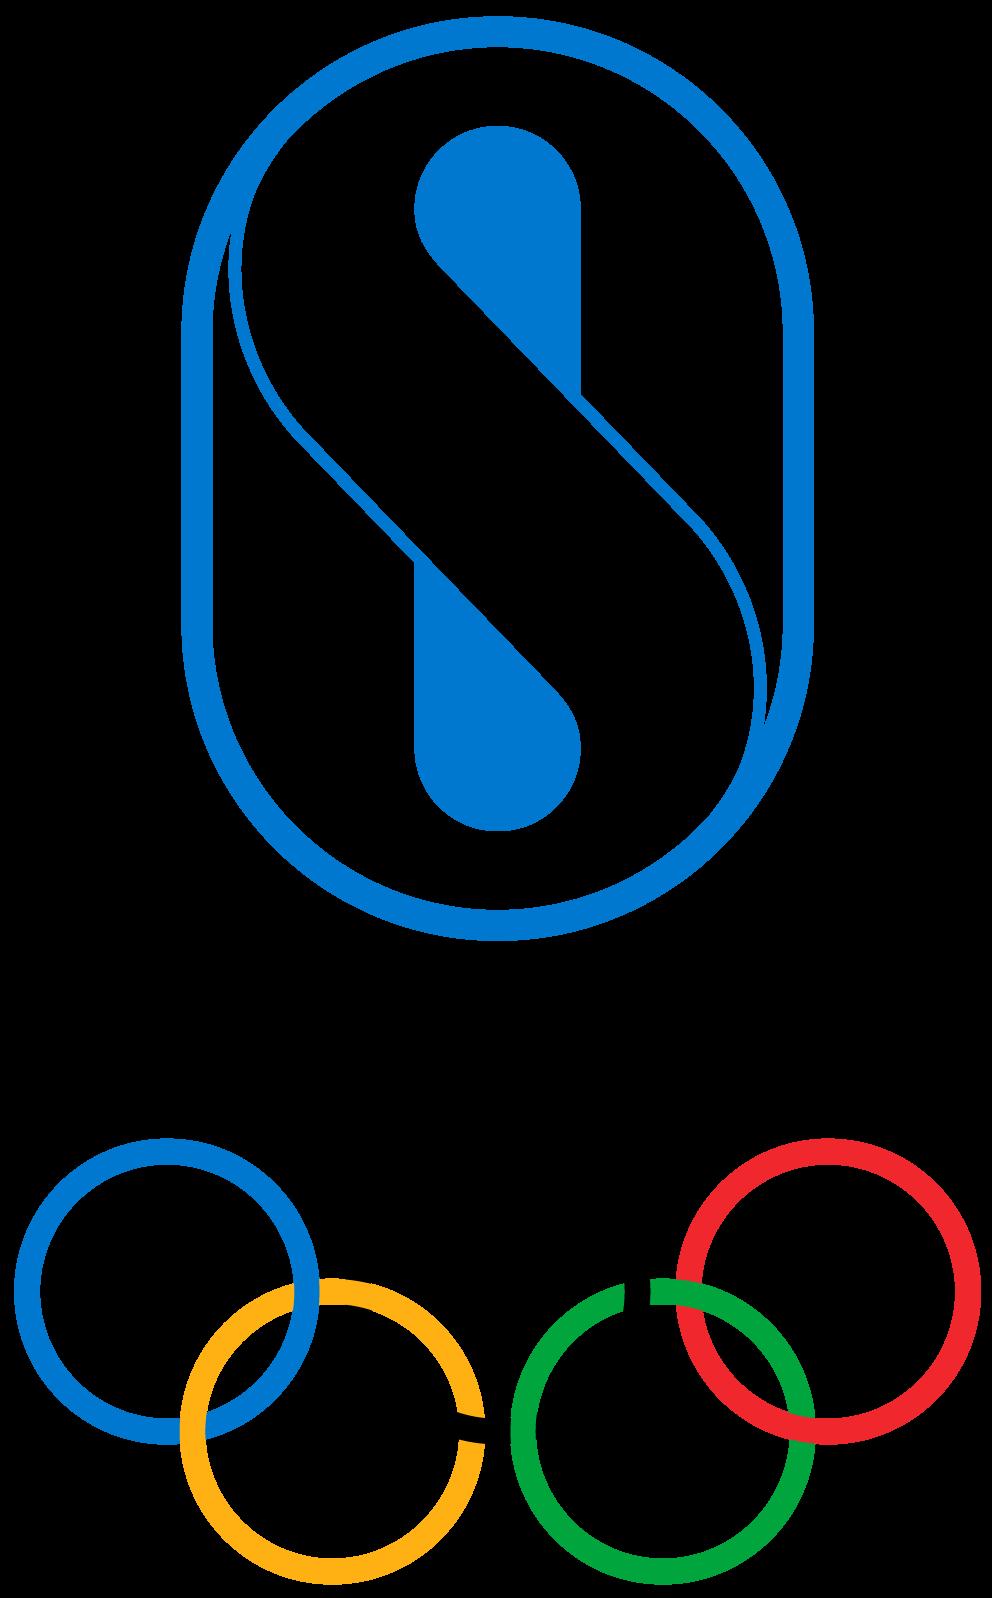 Olympic solidarity